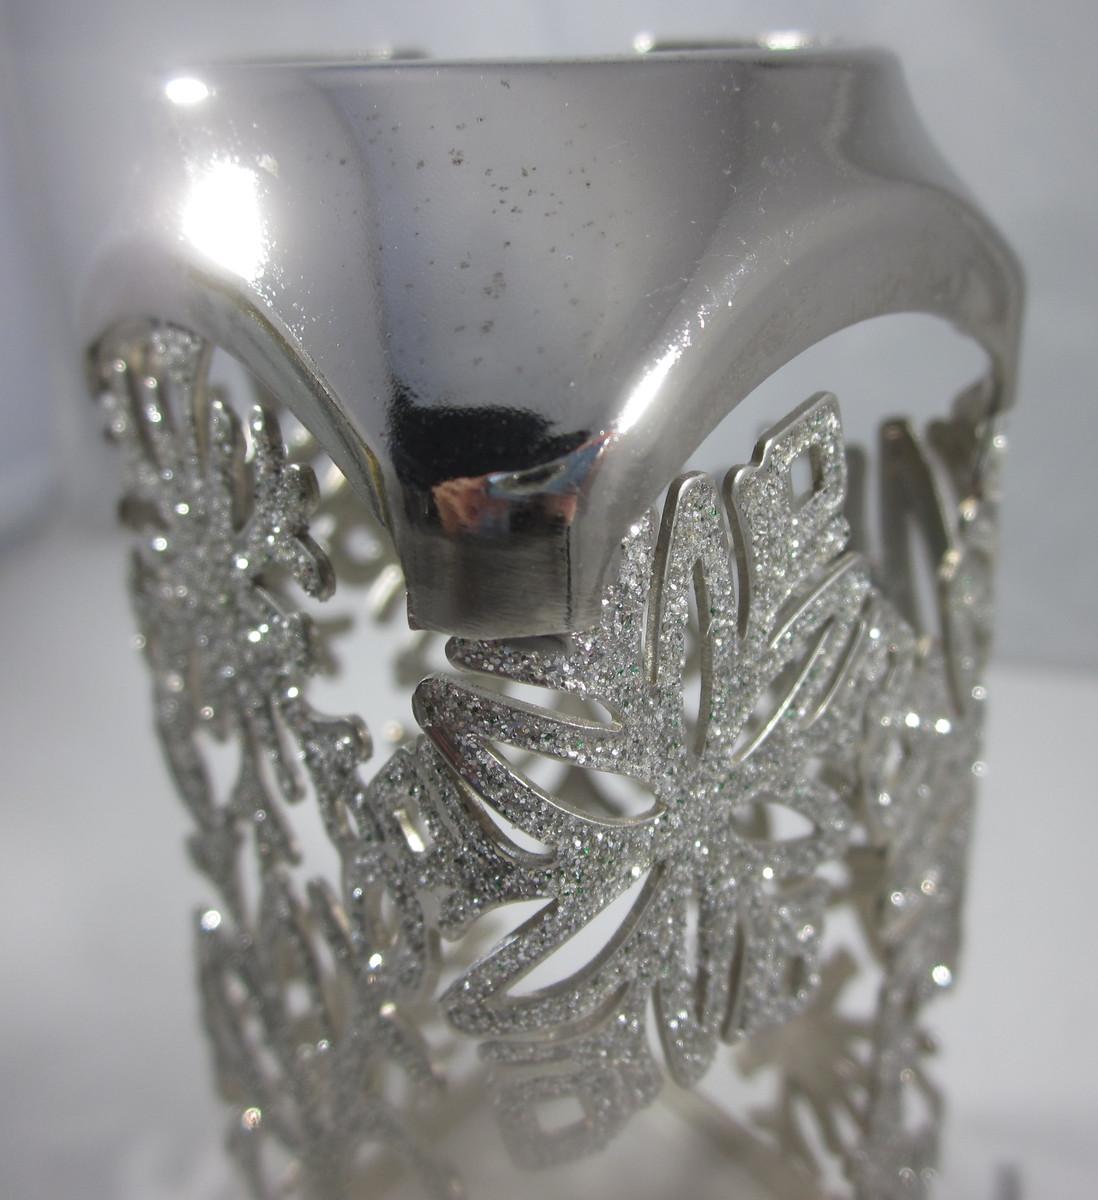 Bath & Body Works Gentle Foaming Hand Soap Sleeve Holder Glitter Snowflakes image 4